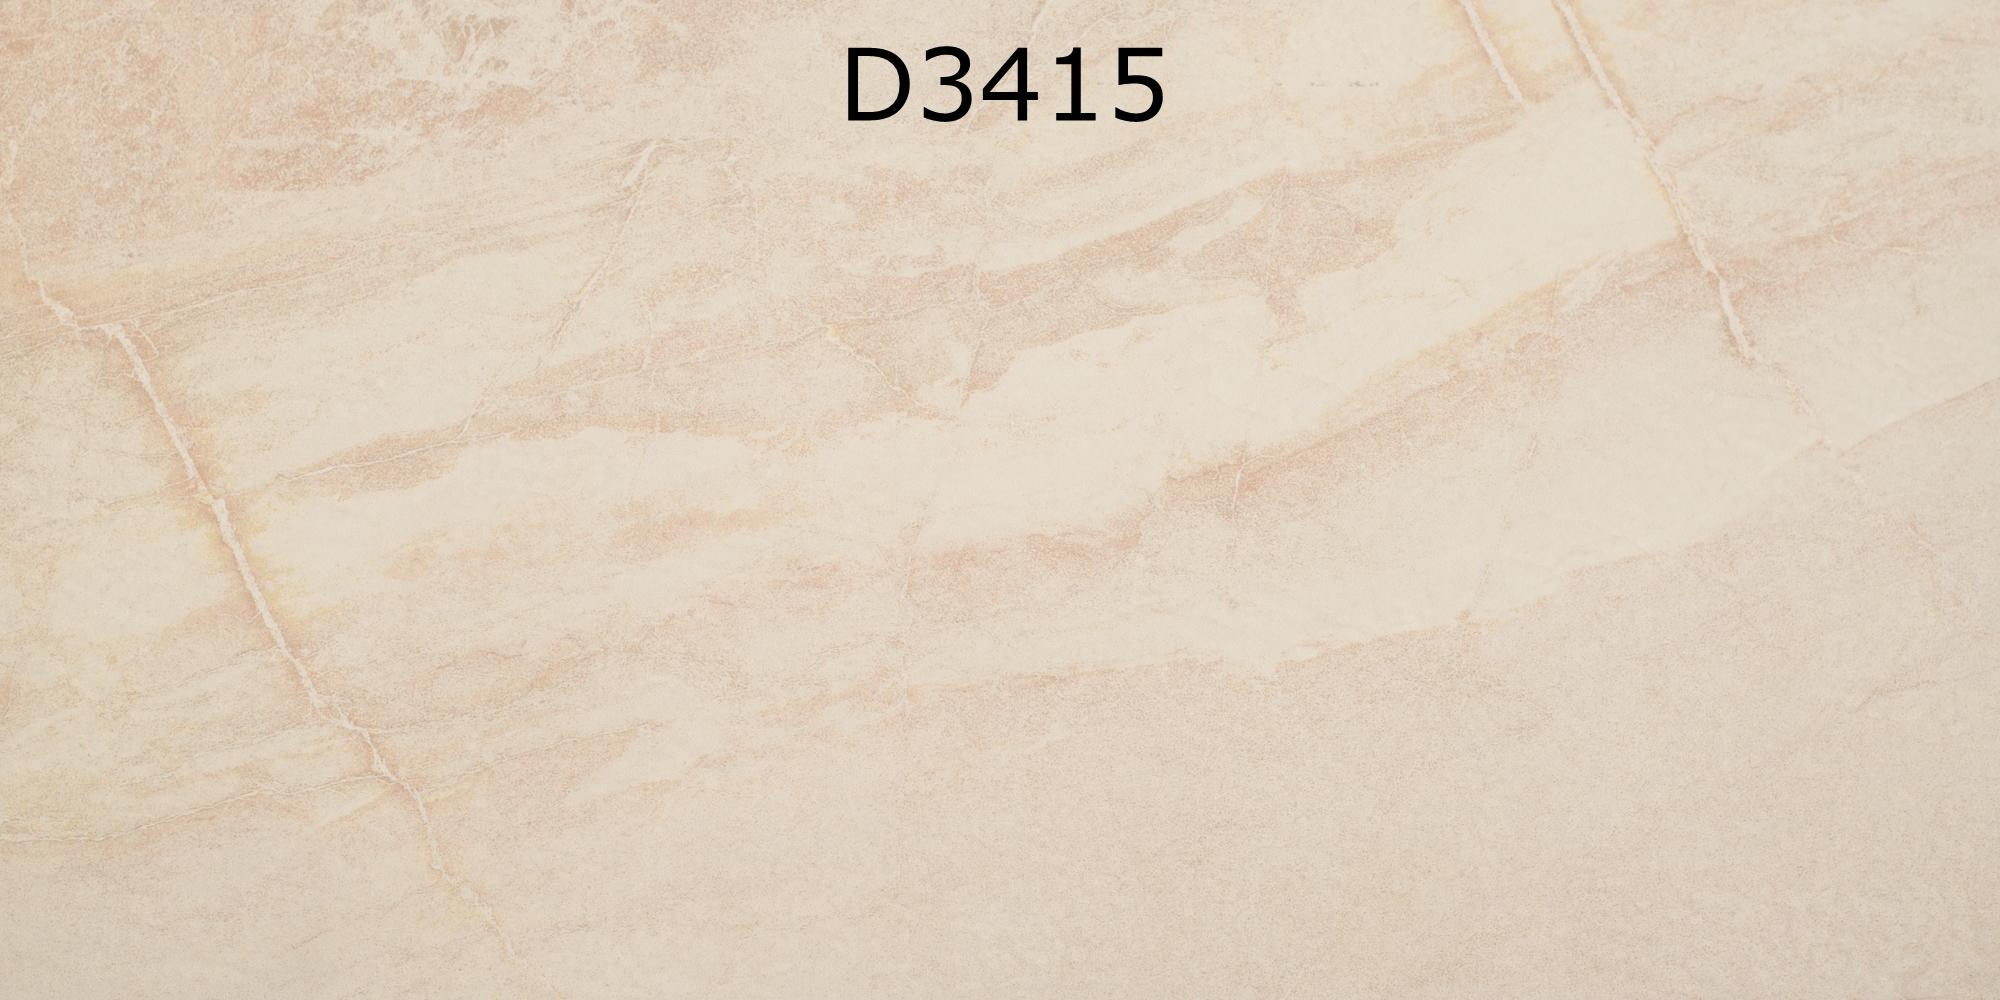 D3415